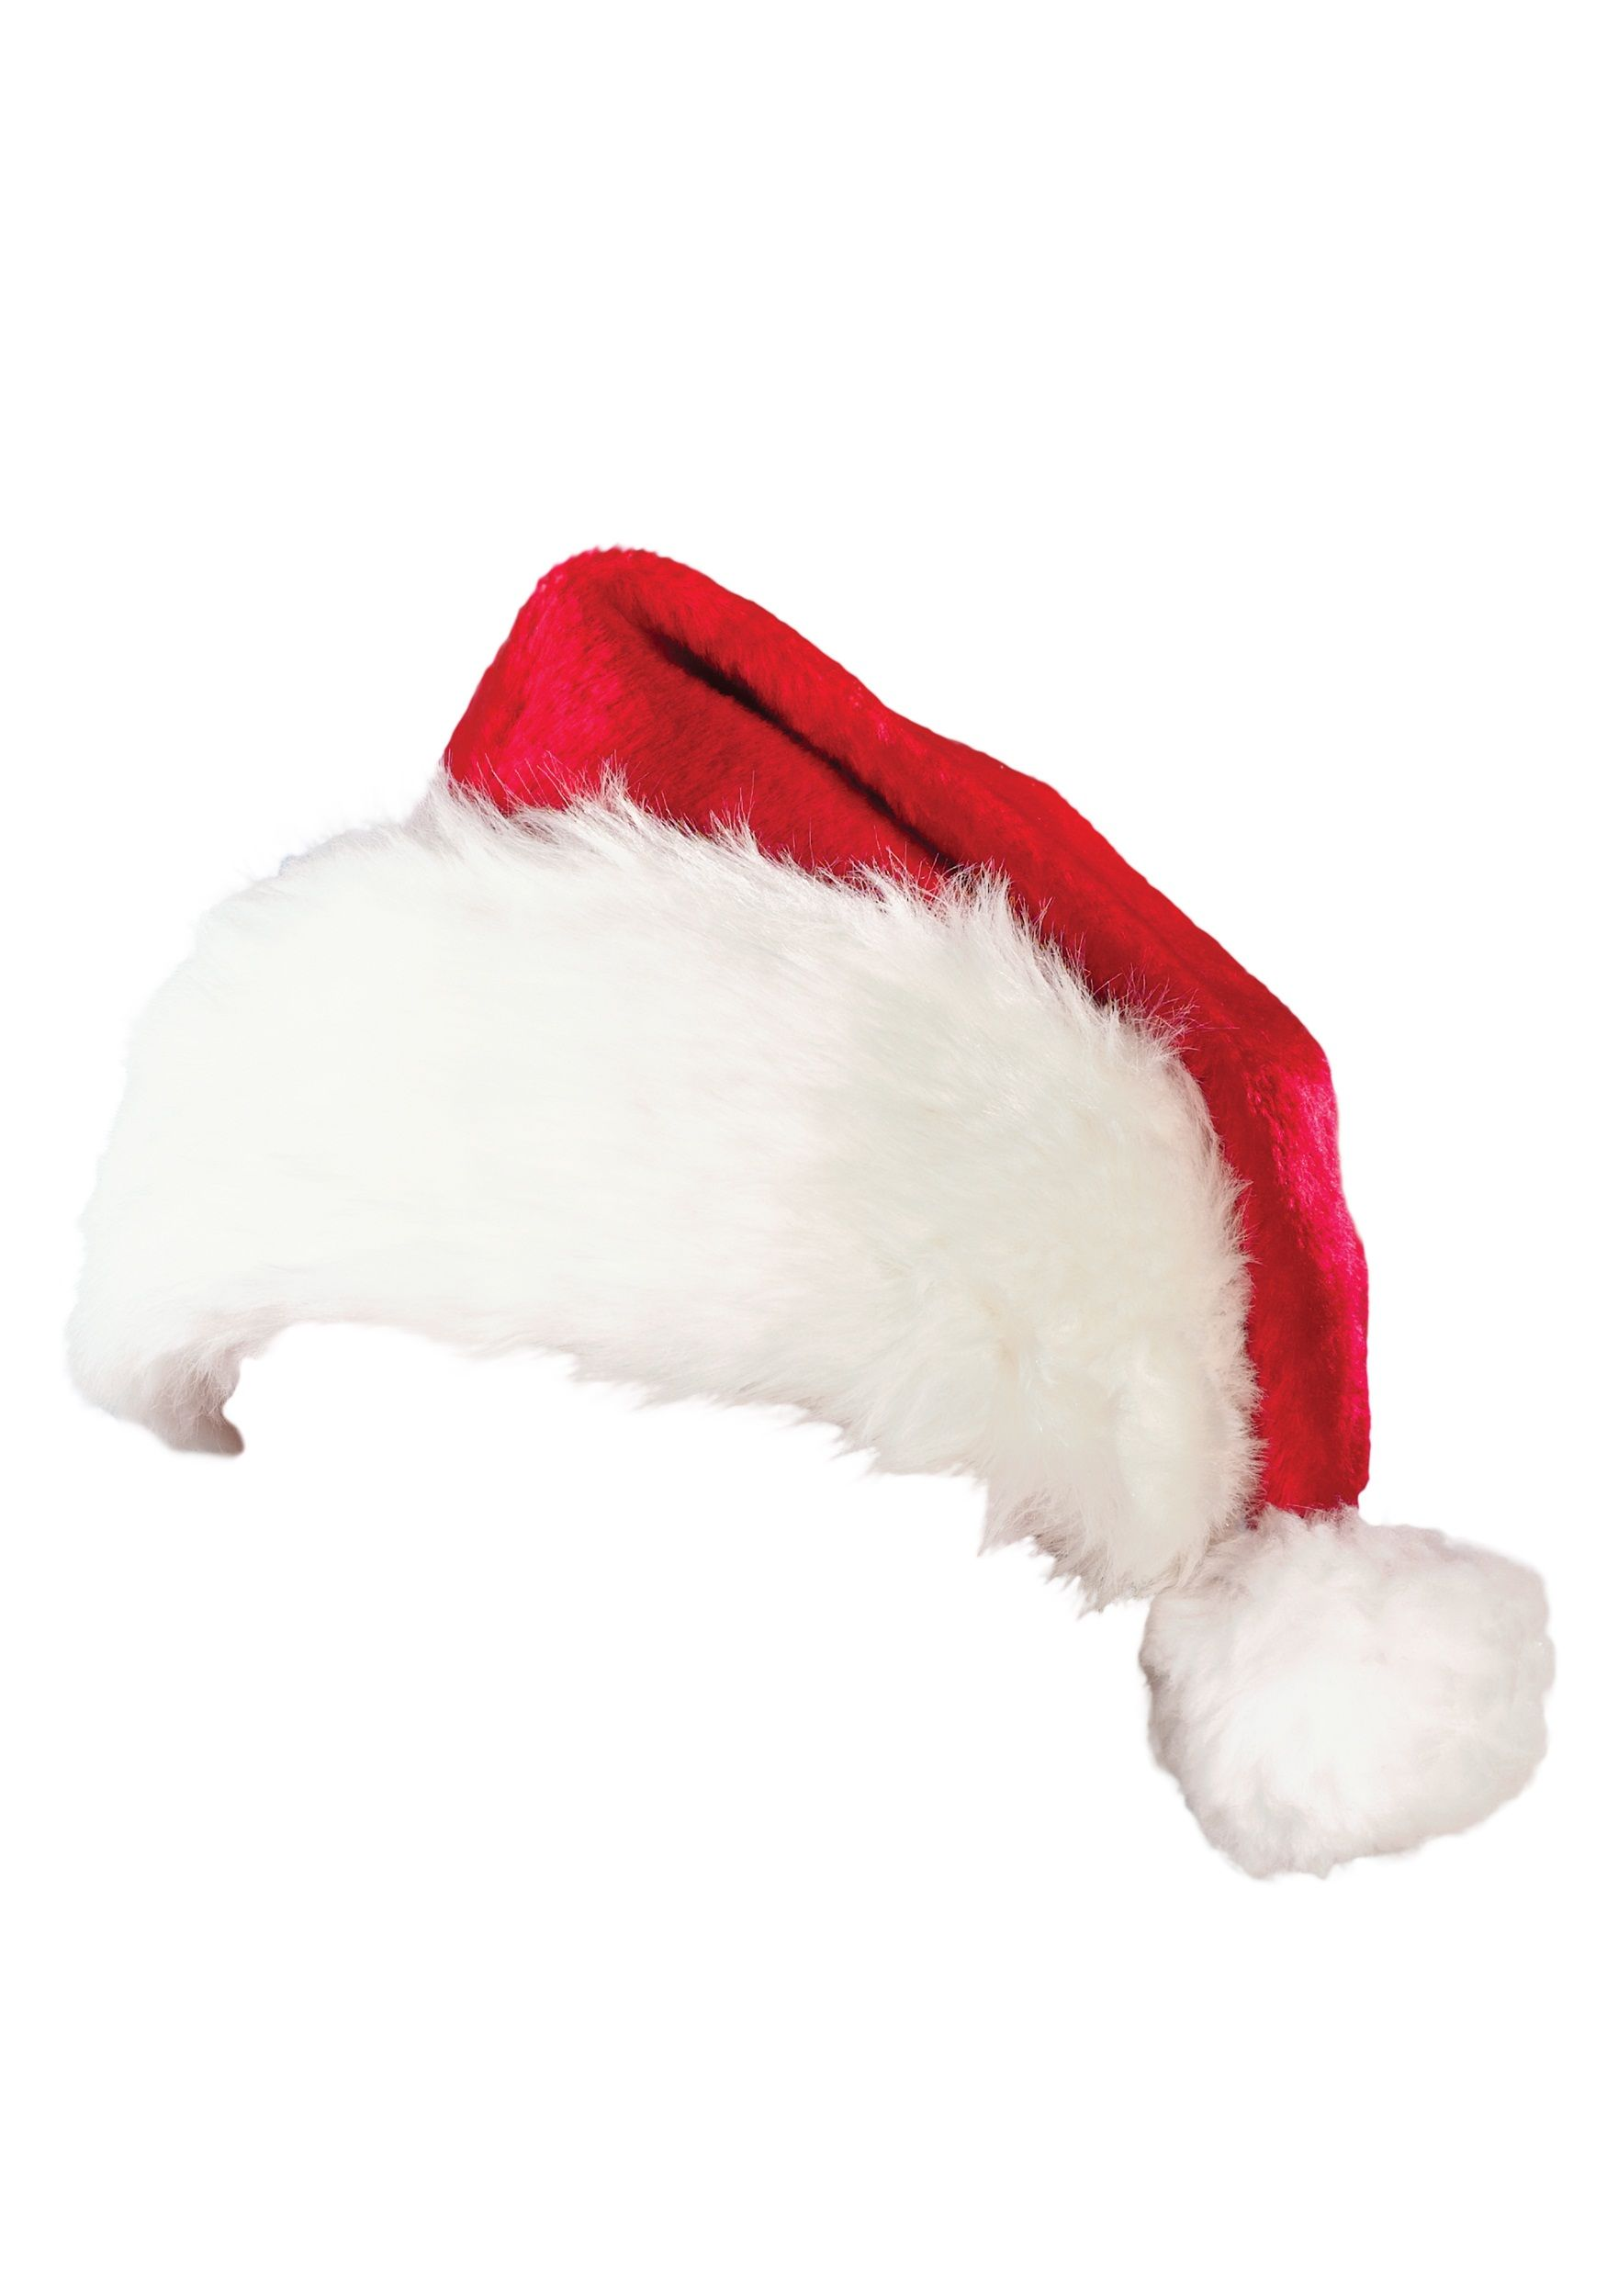 Realistic clipart santa hat Zone Cliparts hat sequen Pink